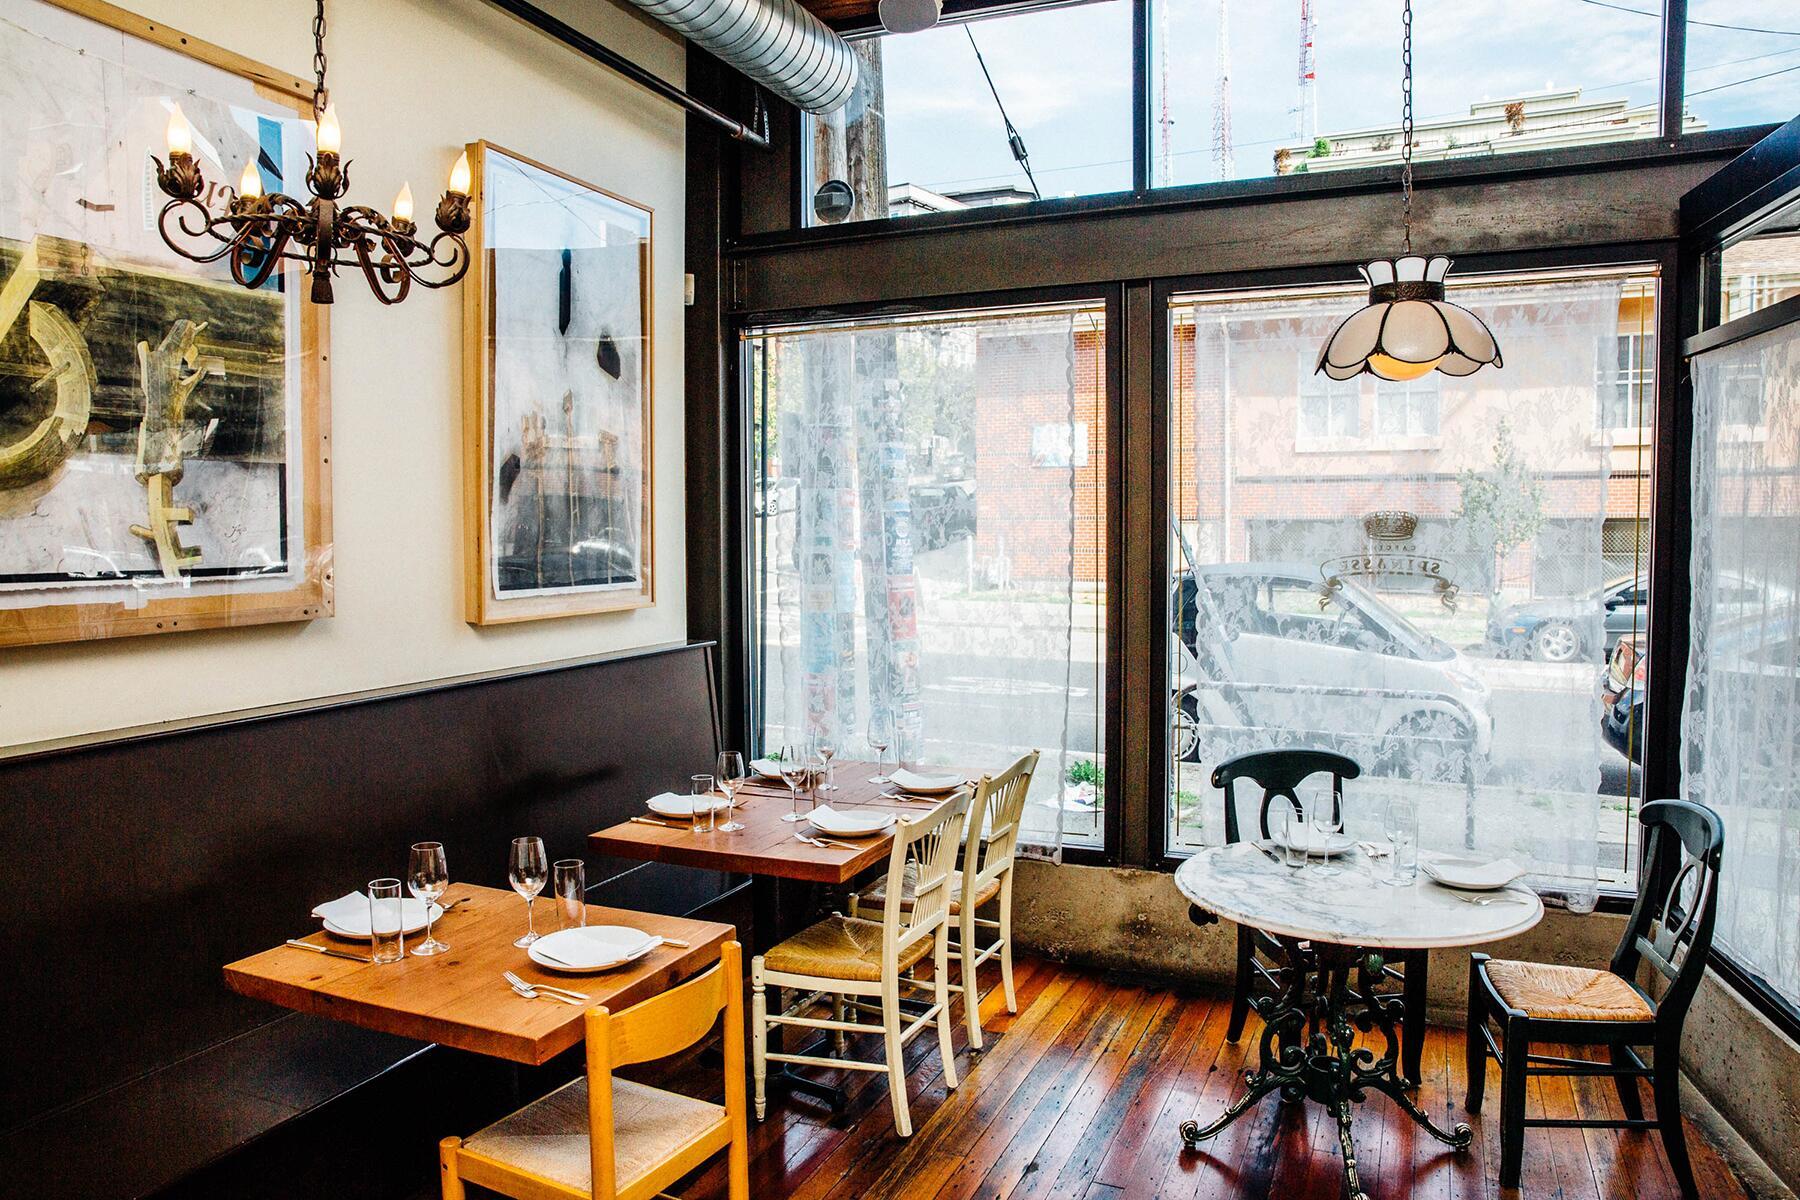 06_ItalianRestaurantsUS__Spinasse_6 Spinasse-53 Dining Room